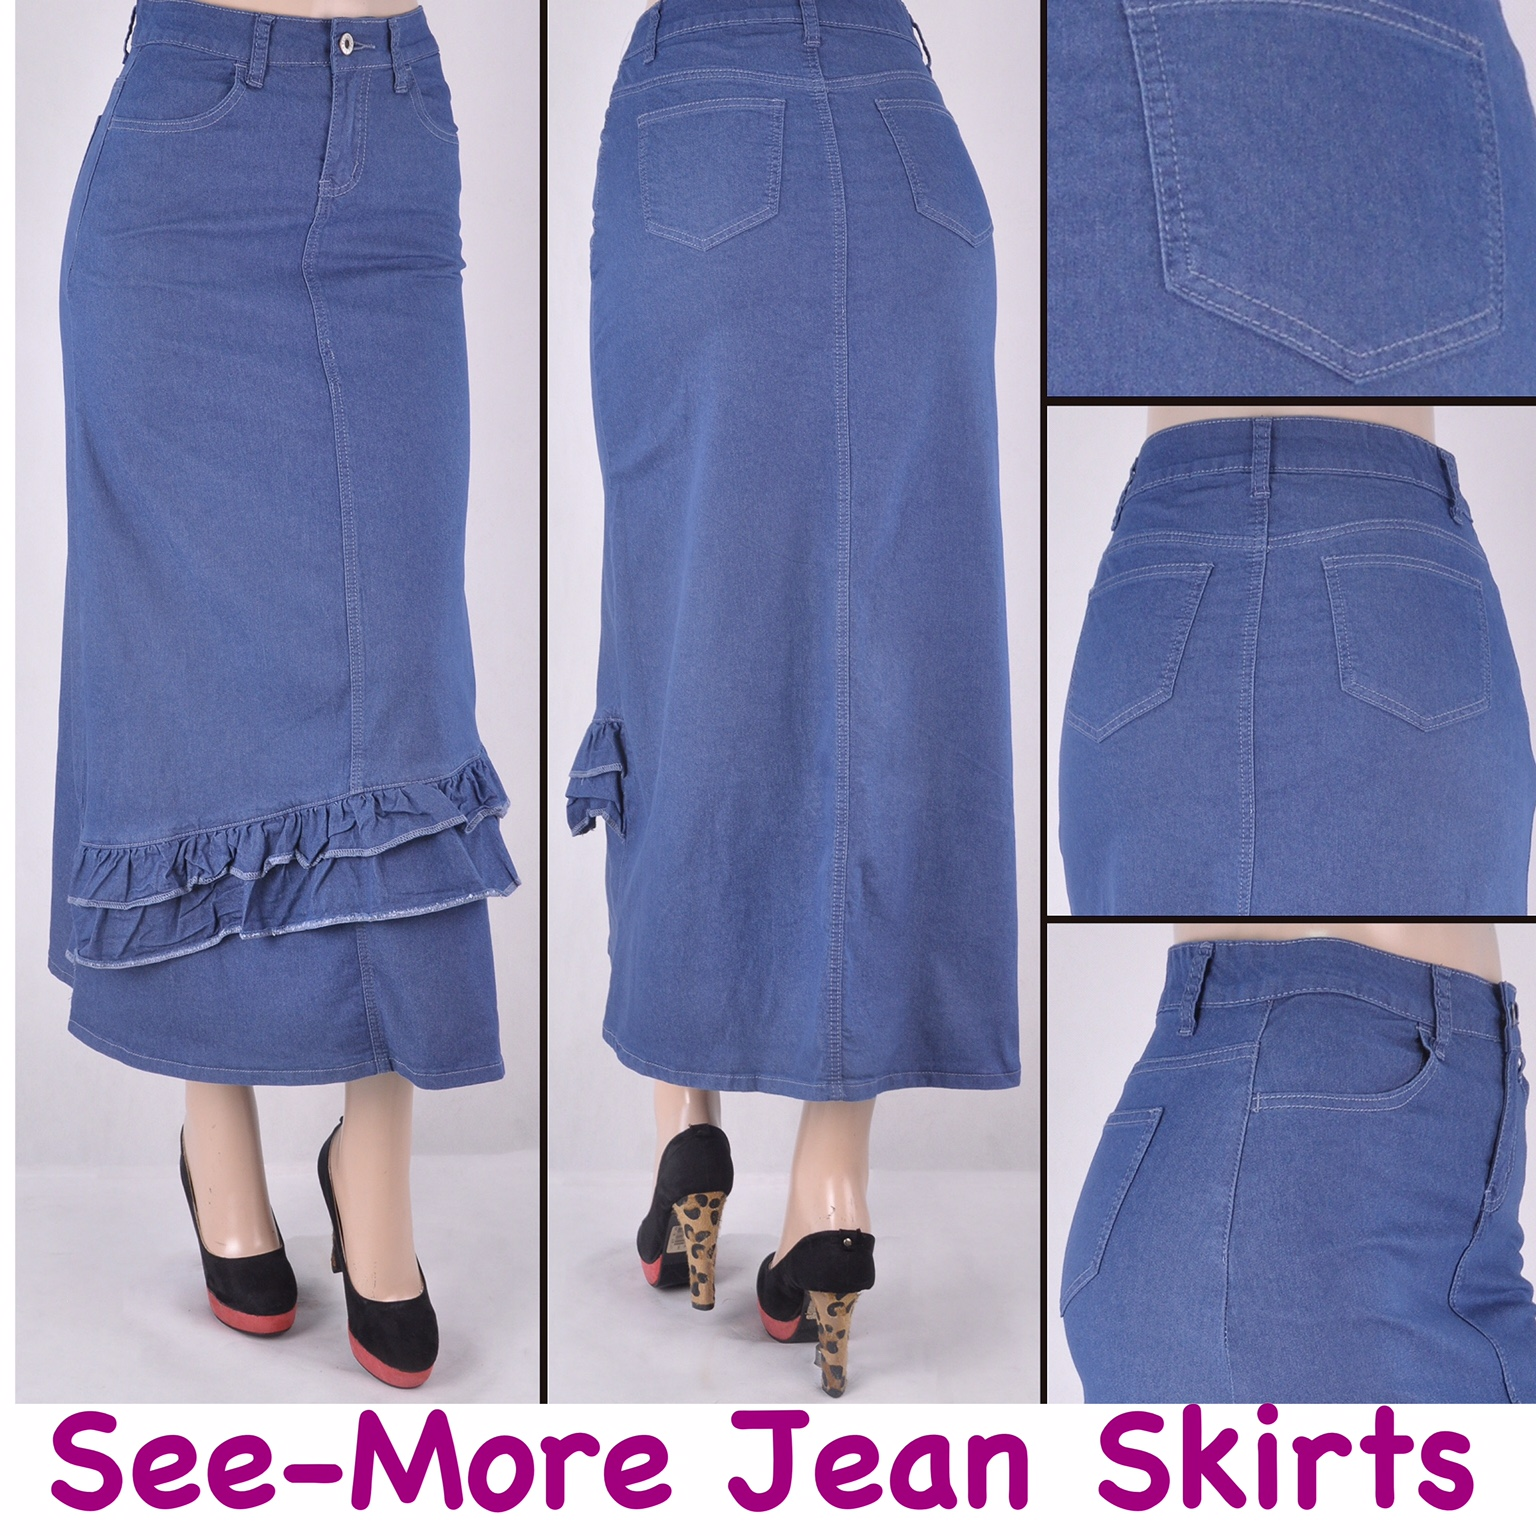 4e249f2241 KENZIE LONG RUFFLE SKIRT BLUE · See-More Jean Skirts · Online Store ...